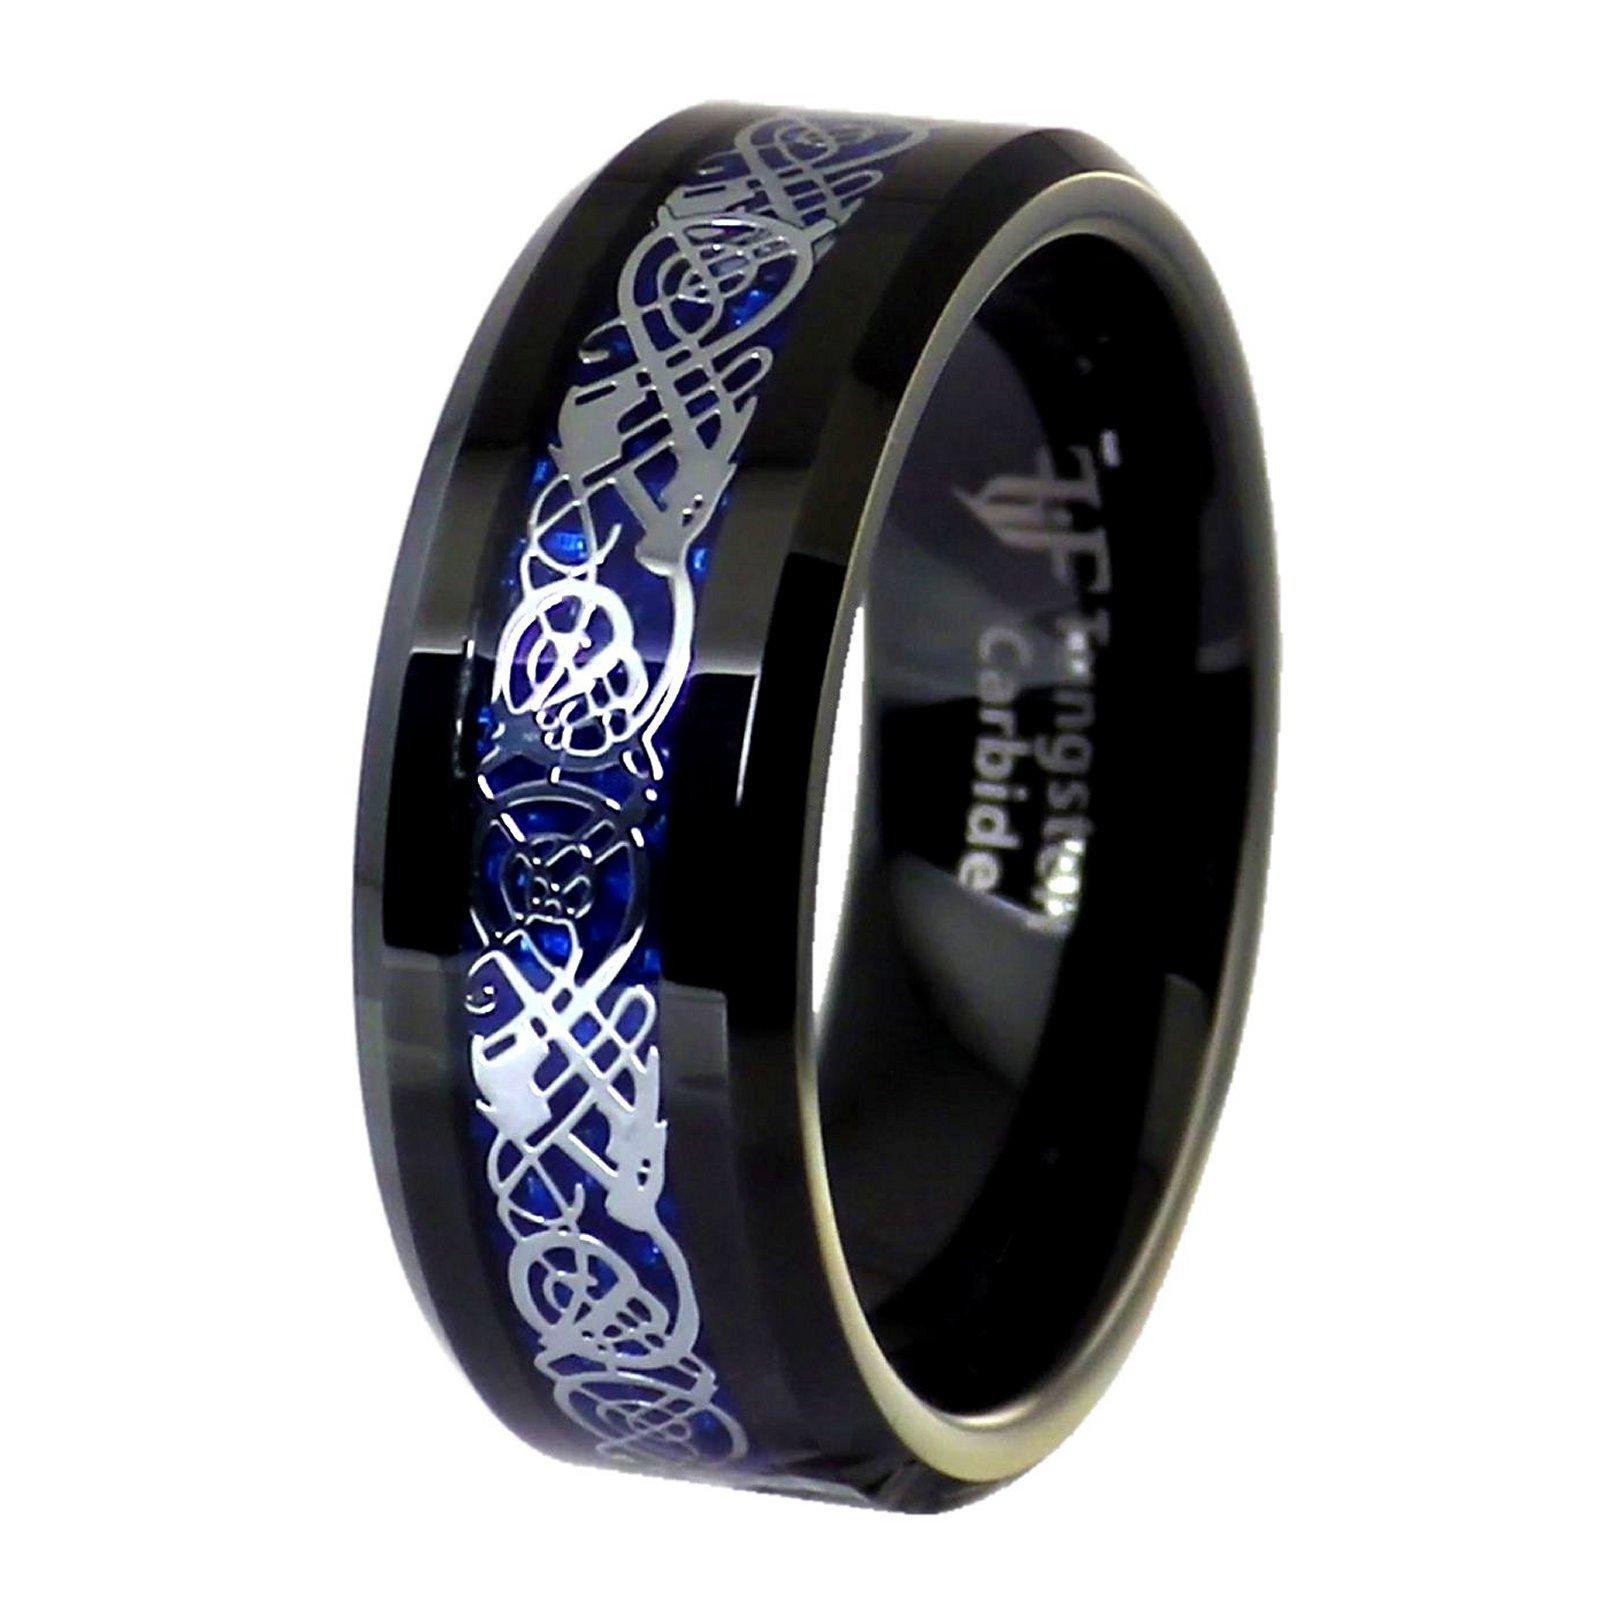 Fantasy Forge Jewelry Blue Carbon Fiber Celtic Dragon Black Tungsten Ring Size 17